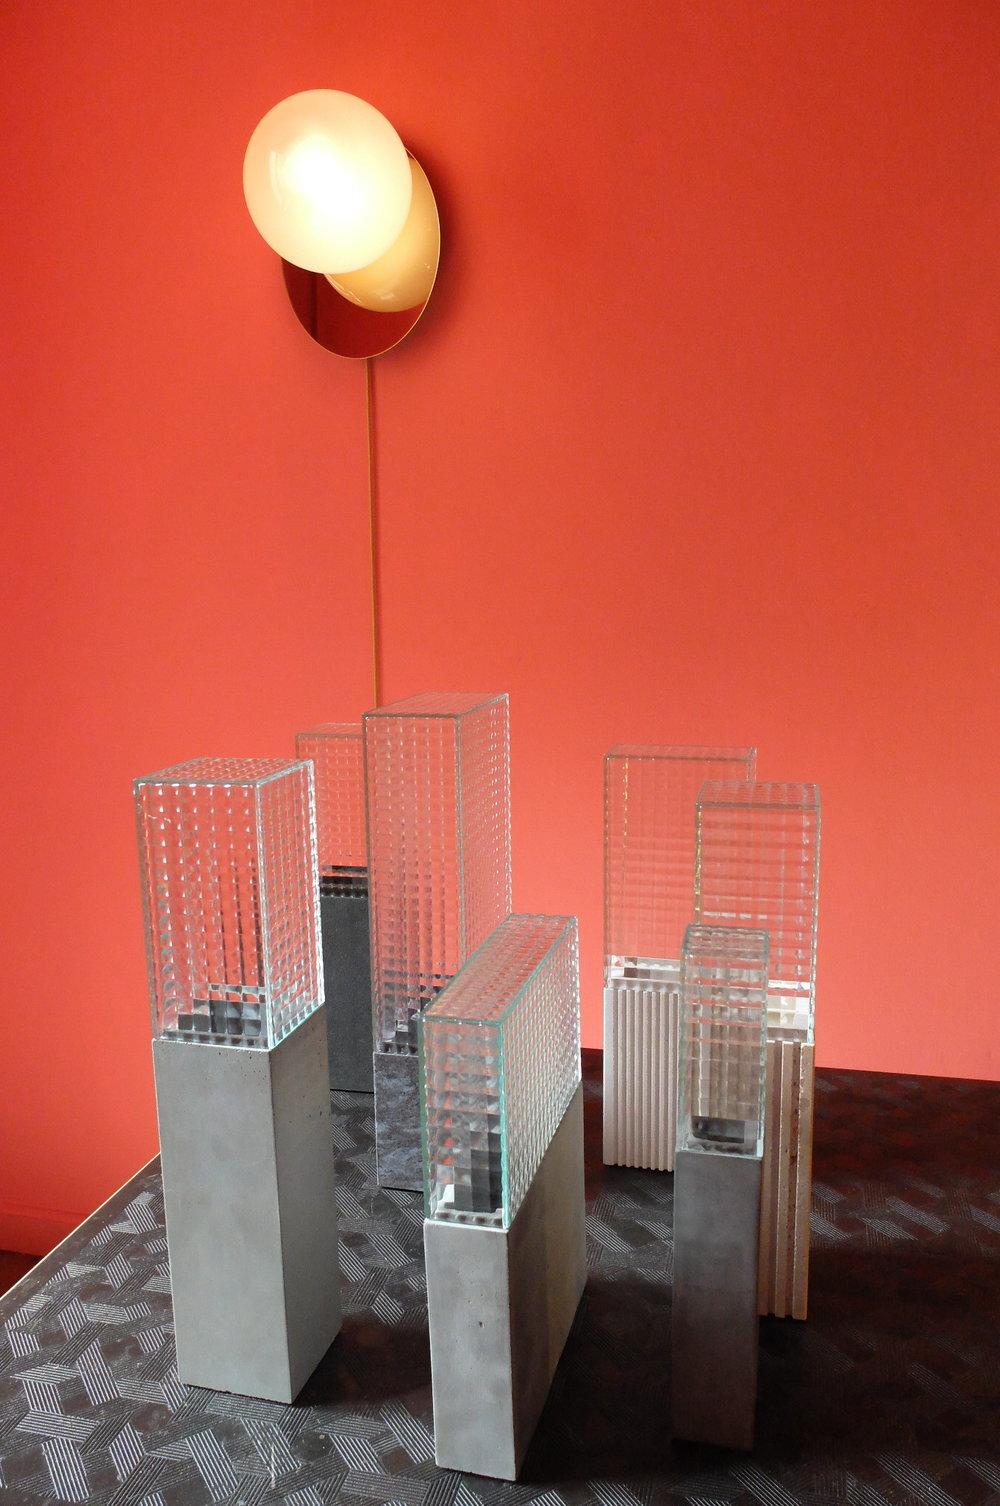 Home design experience. Vases Le 55 by Barbara Schweizer. PALERMO UNO